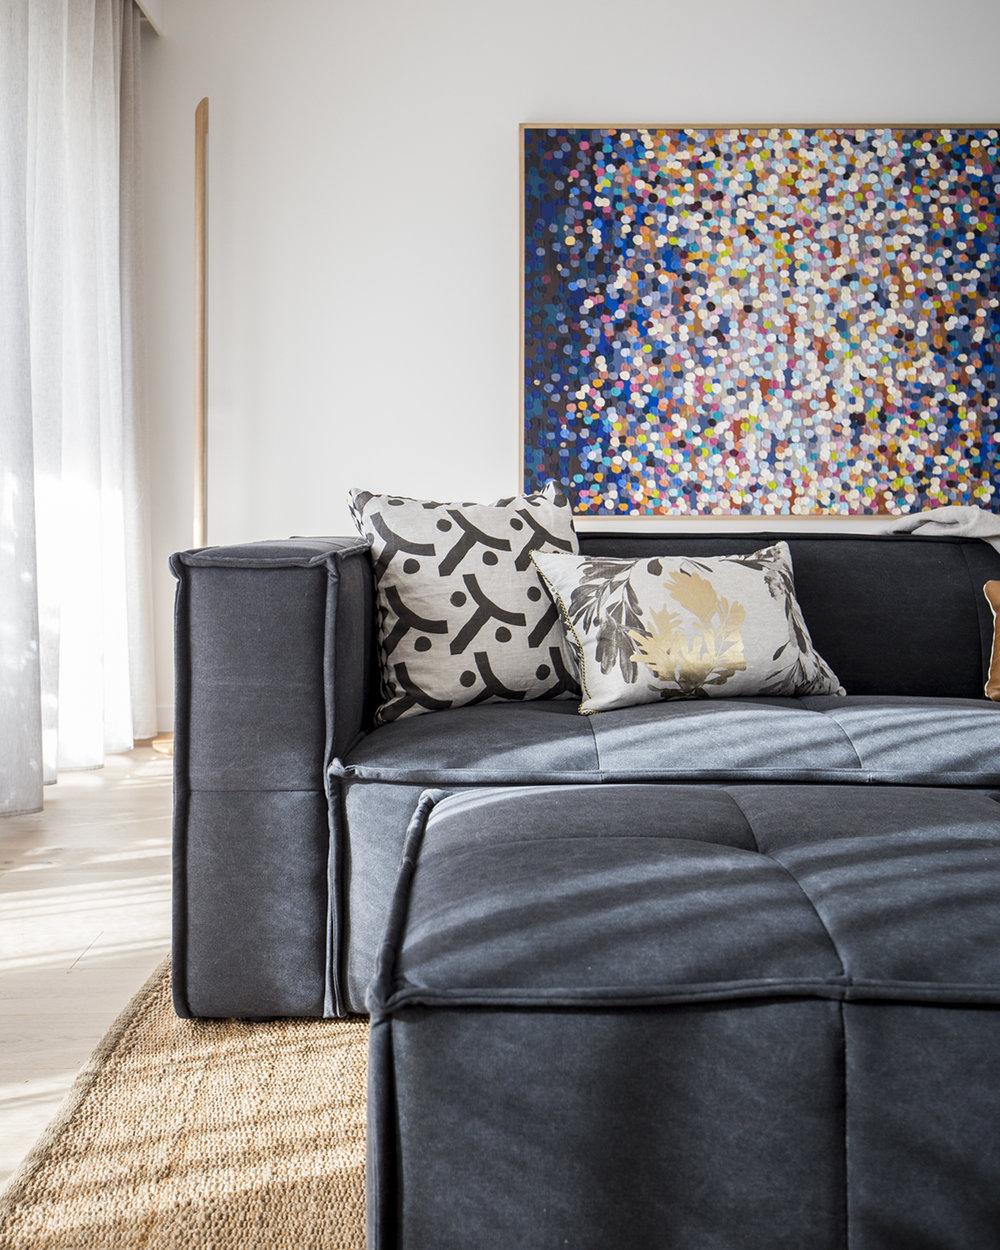 Kira and Kira - Gold Coast Property Styling - Home Interiors - Furniture DesignIMG_6705 - small - instagram.jpg